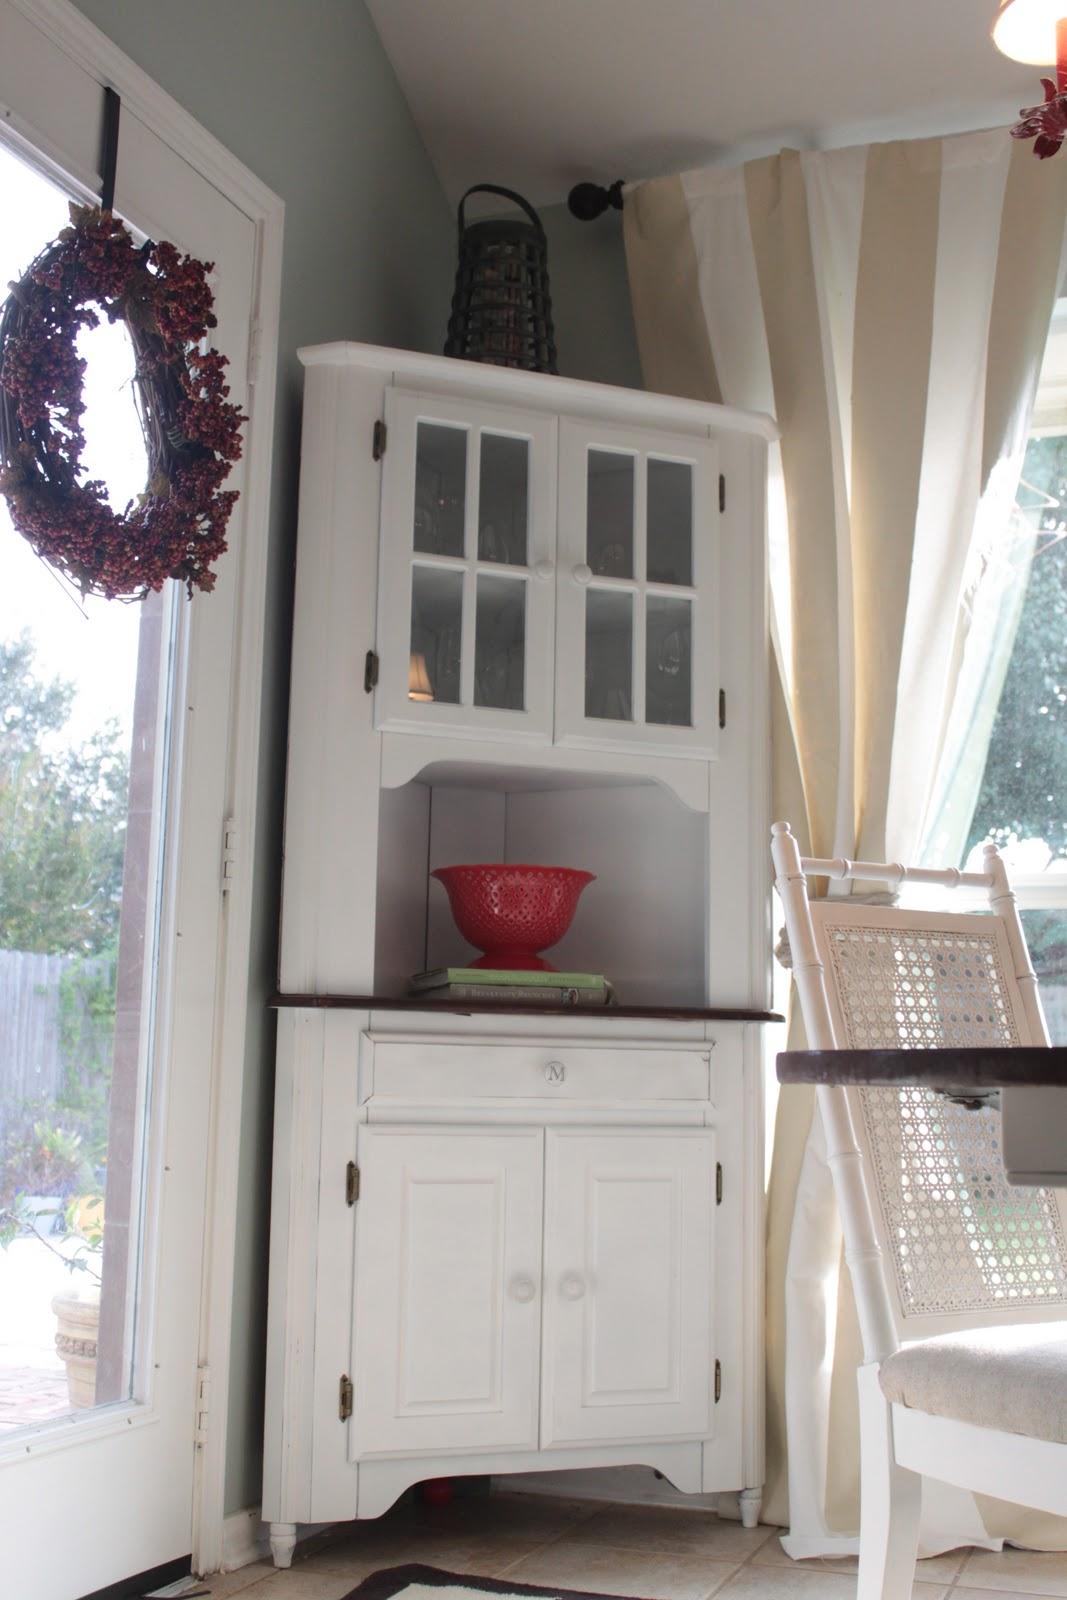 SEM Interiors : My Lovely Corner Hutch